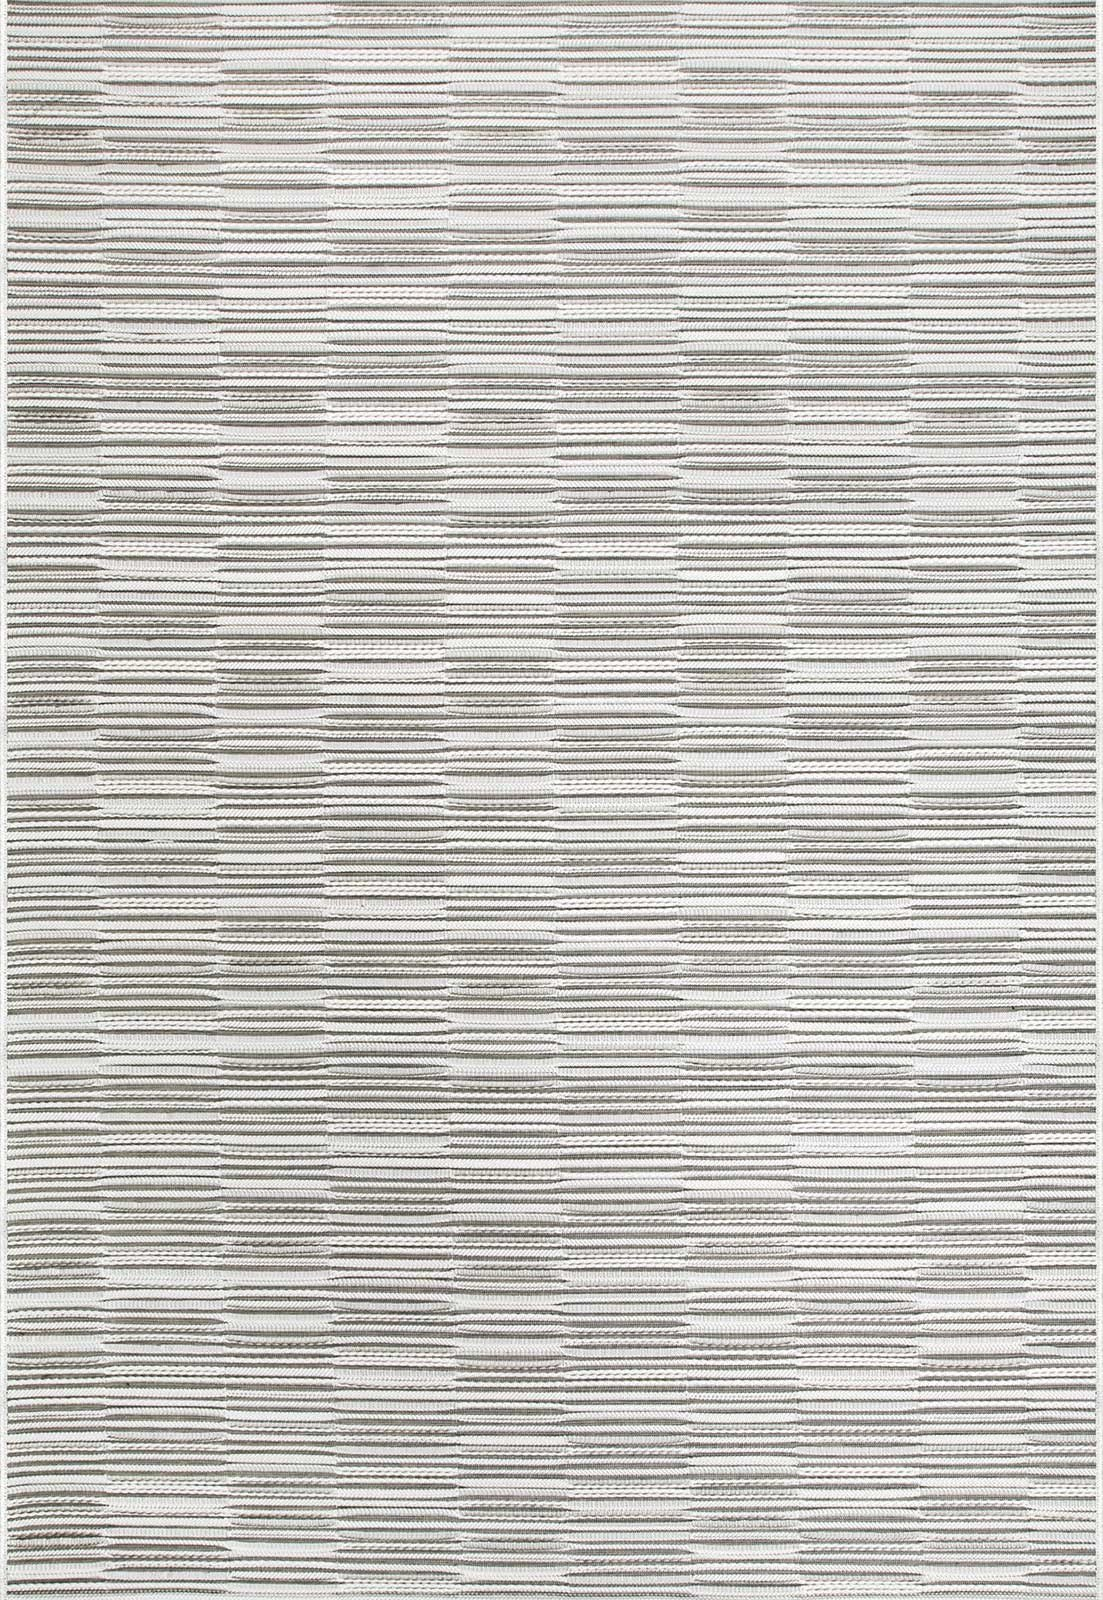 Brooklyn tapis d 39 ext rieur by italy dream design kallist - Tapis d exterieur ...